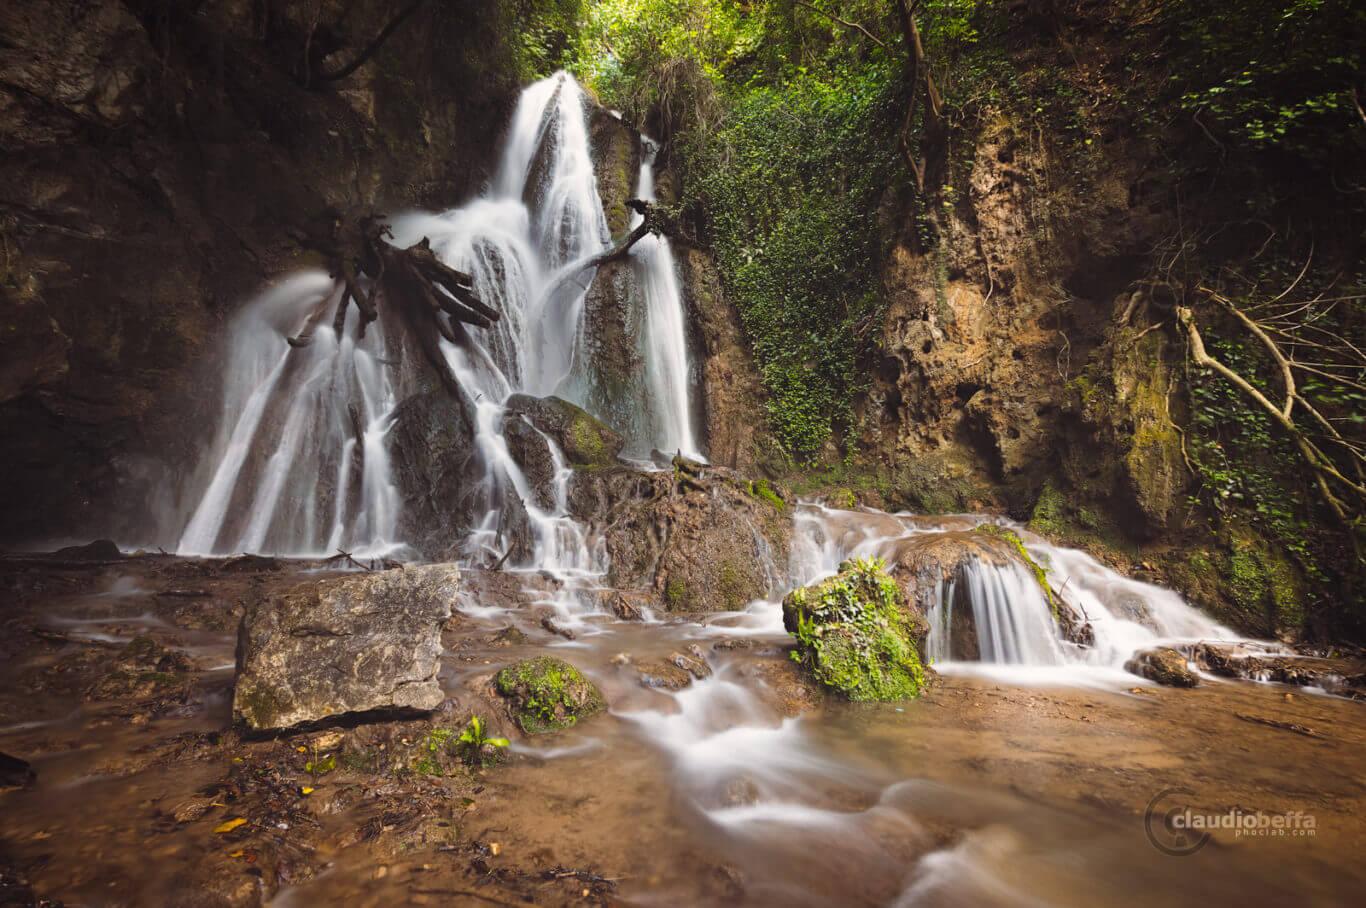 Menotre, Waterfalls, Umbria, Italy, Nature, Forest, Water, Menotre waterfalls